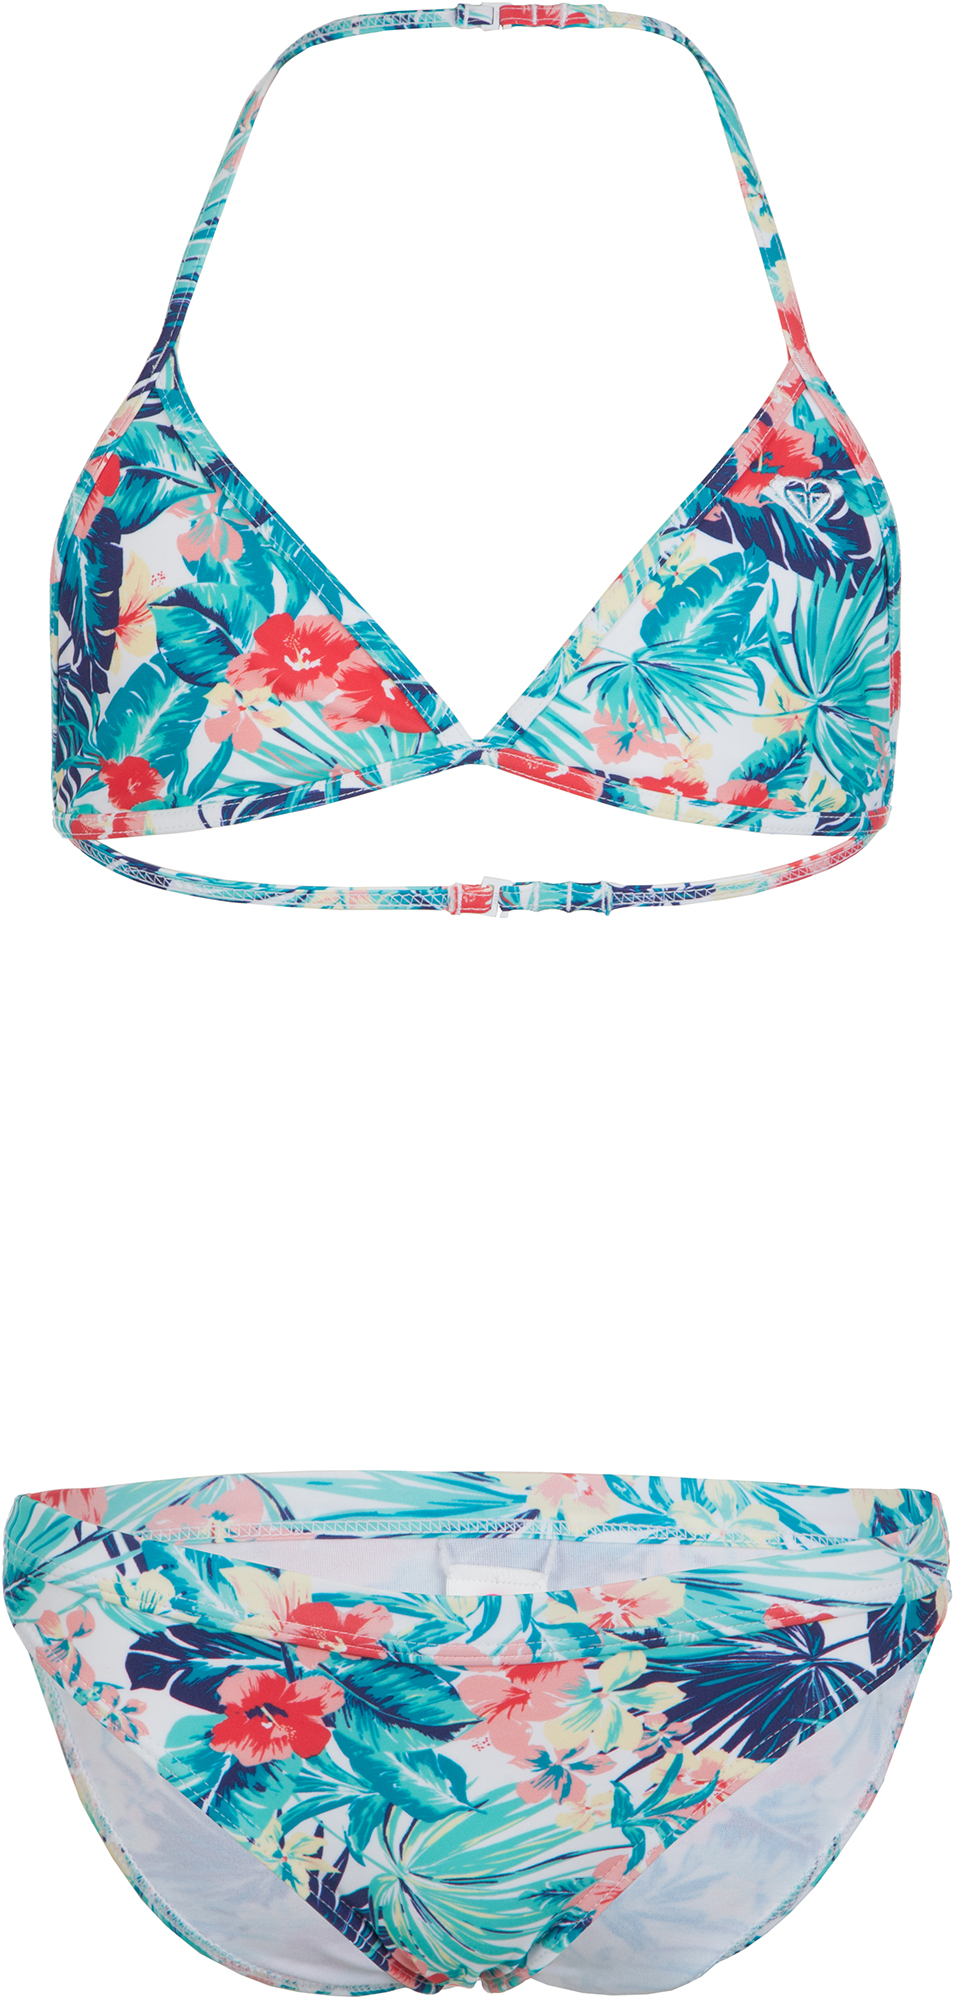 Roxy Бикини для девочек Roxy Beach Cruising, размер 152-158 купальник roxy roxy ro165egakgf1